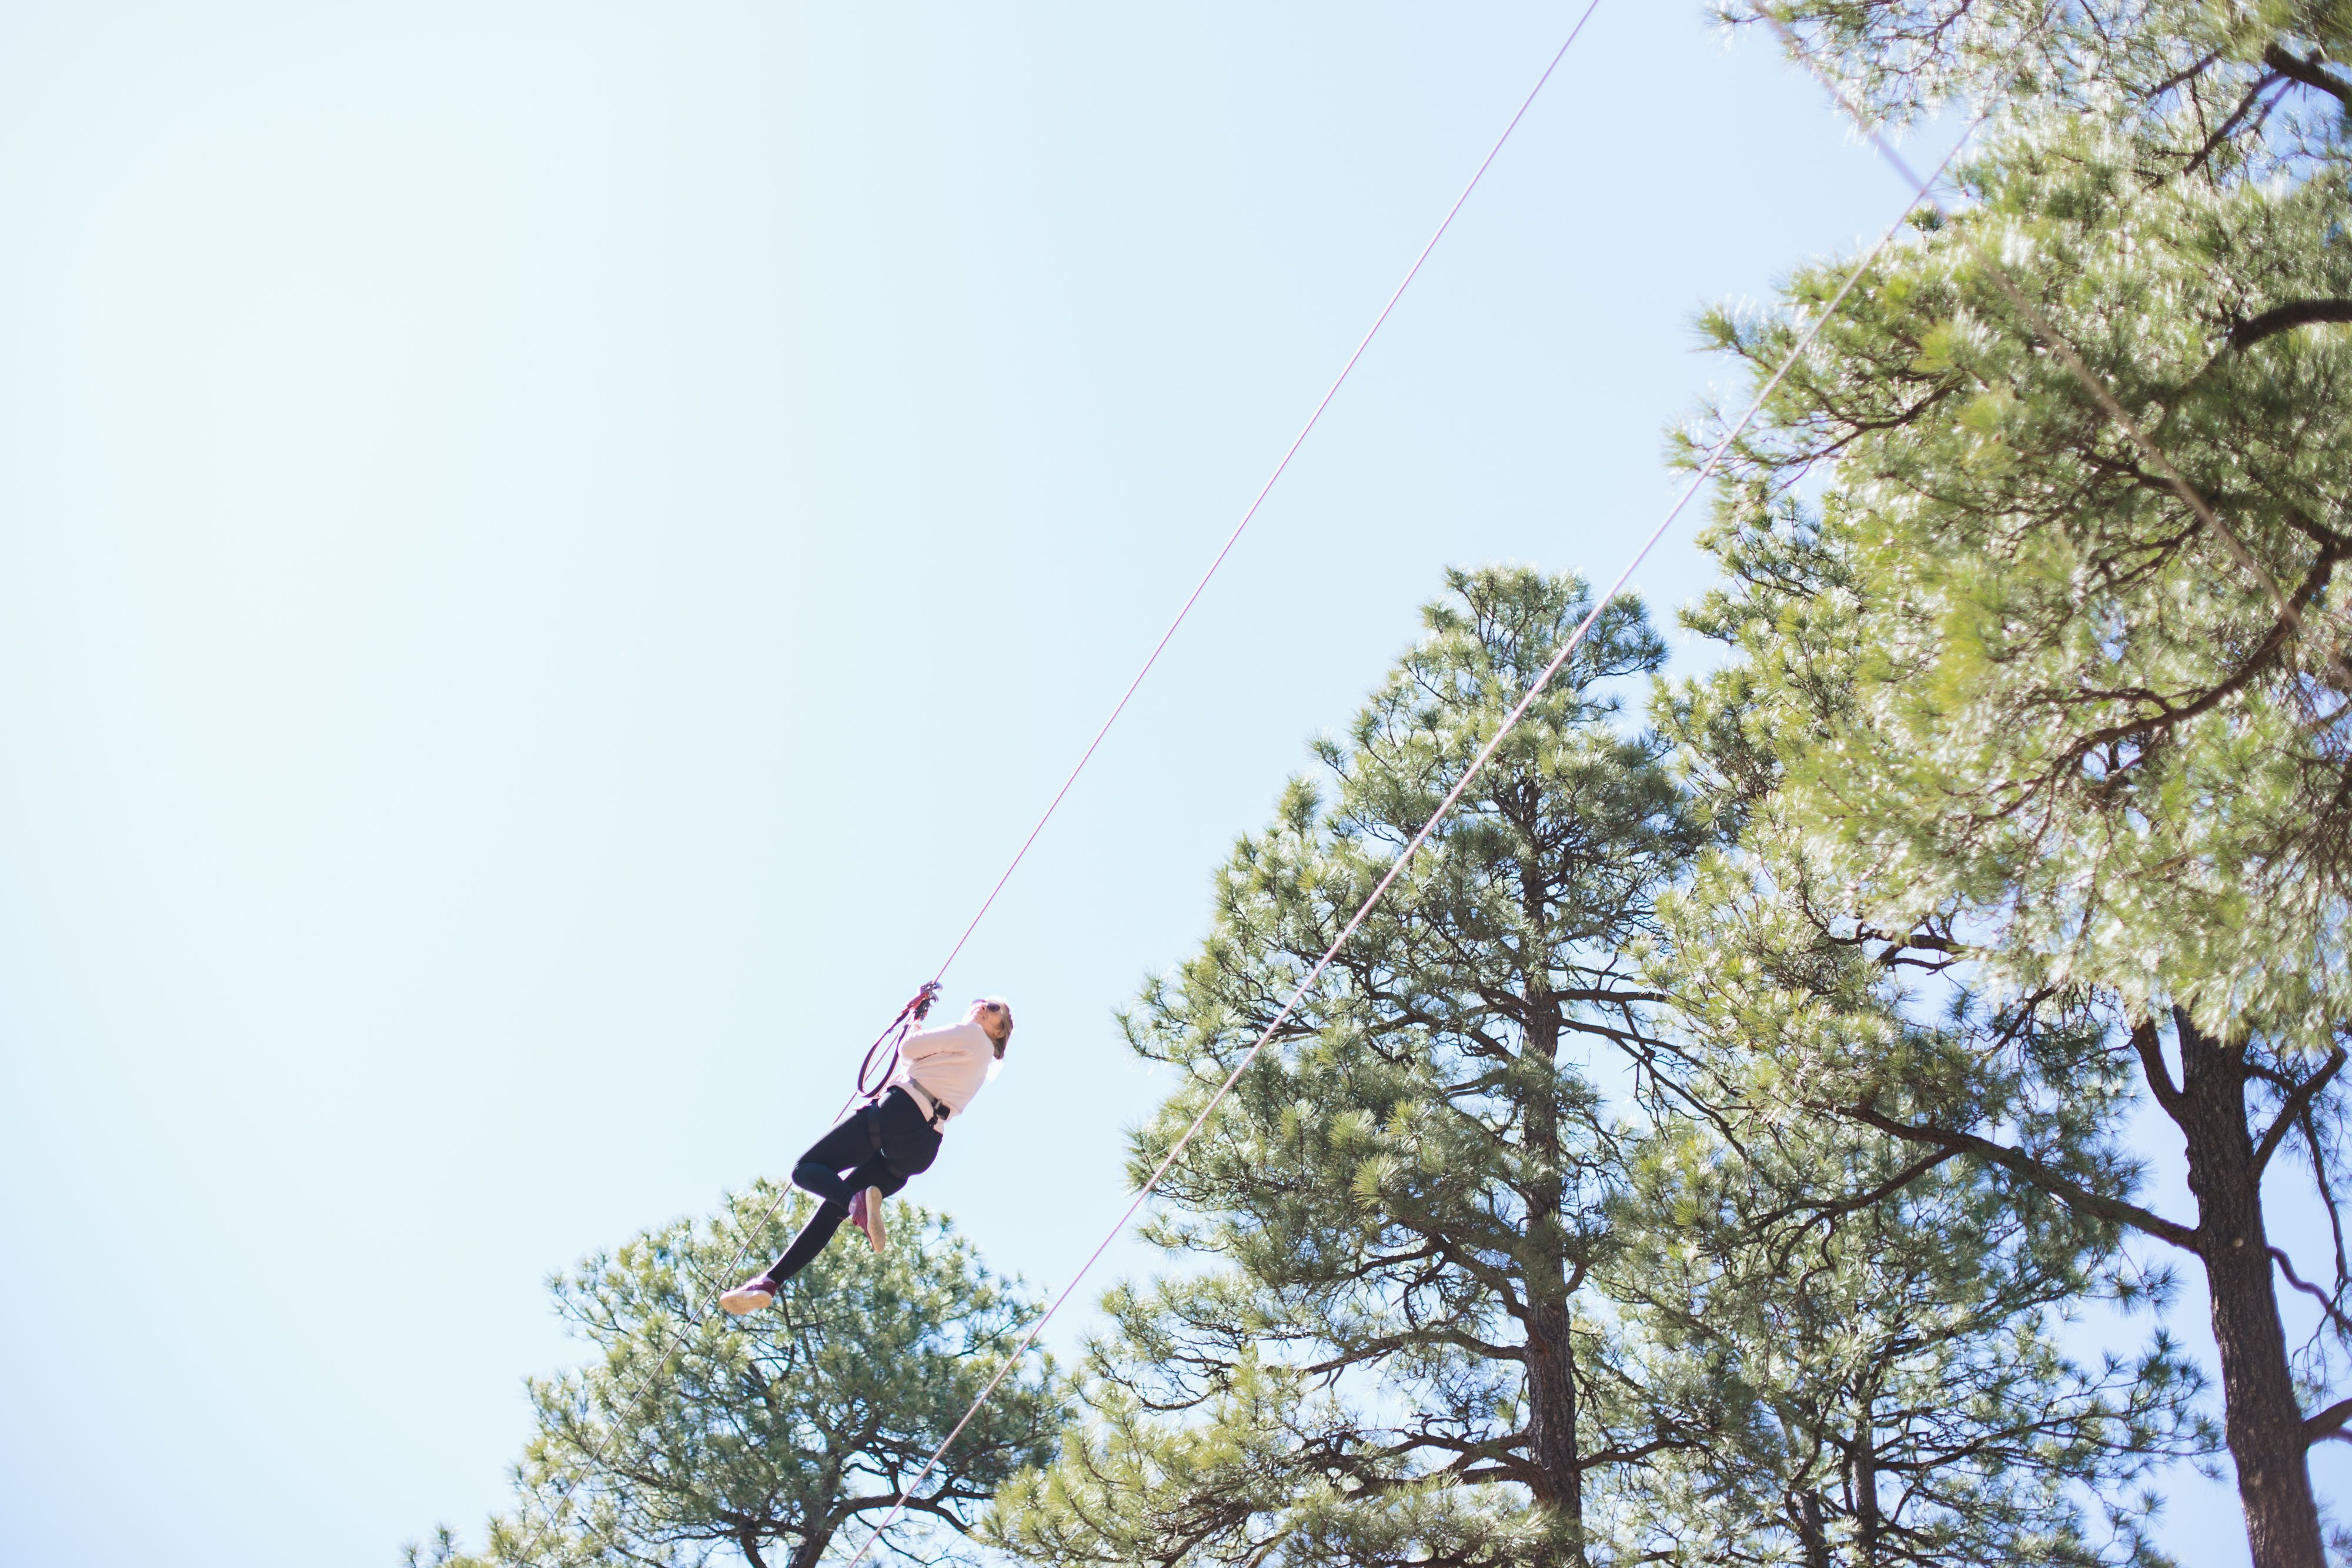 Arizona Zip Lining Flagstaff Extreme Ziplining Extreme Adventure